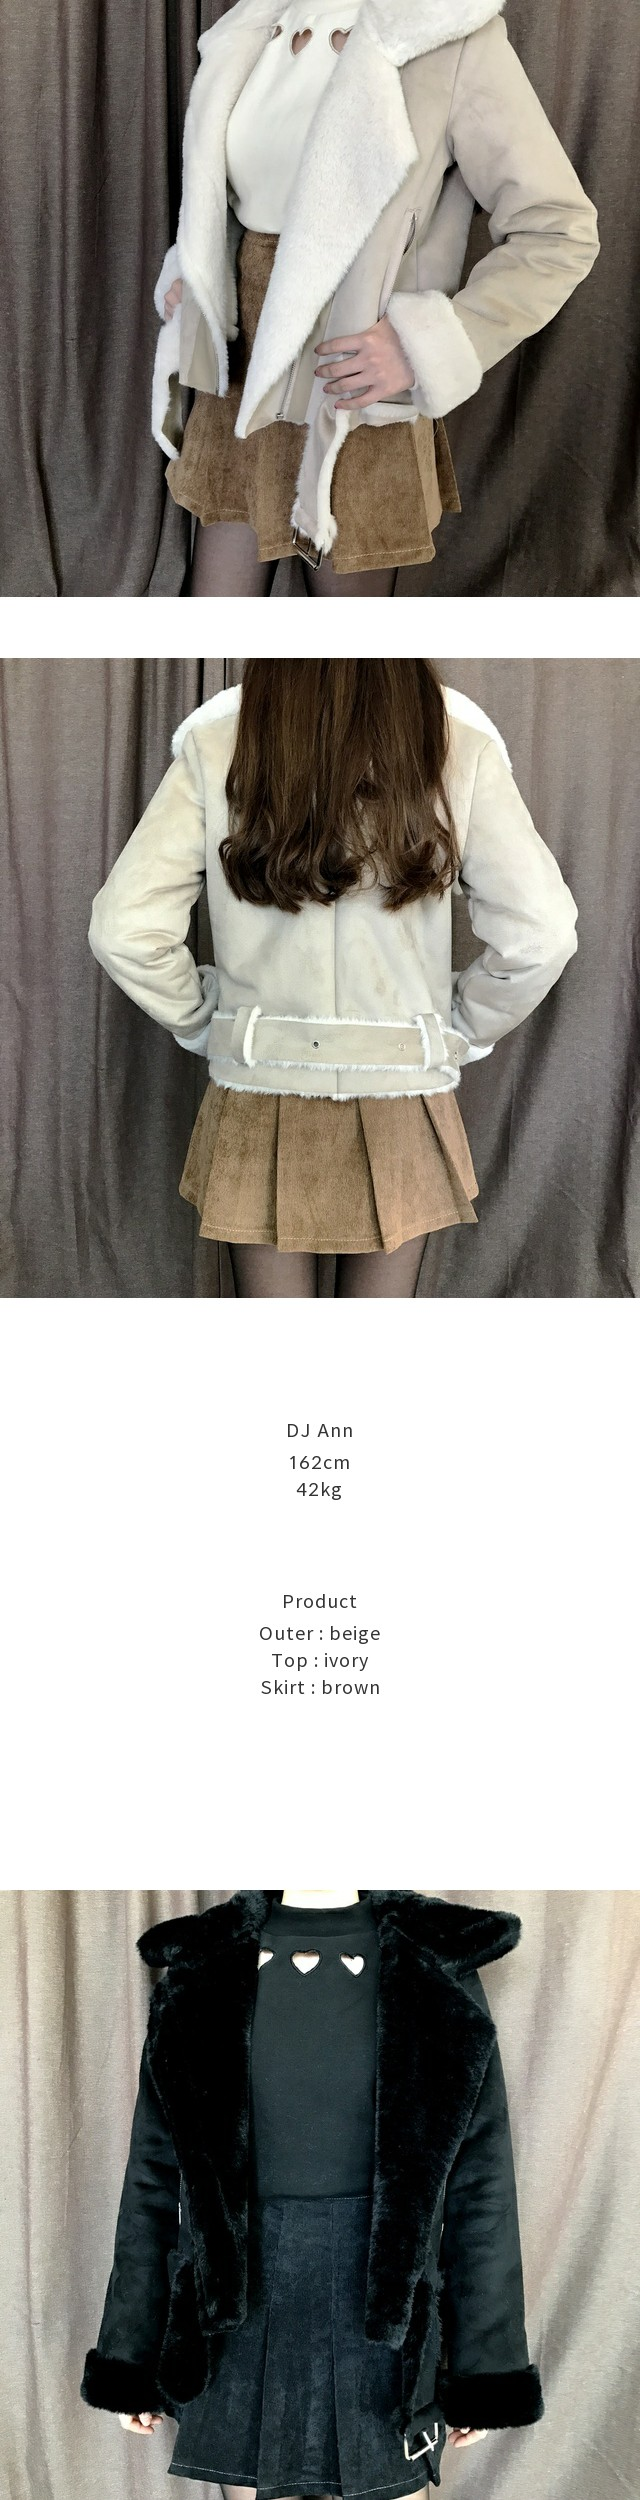 Benny corduroy skirt